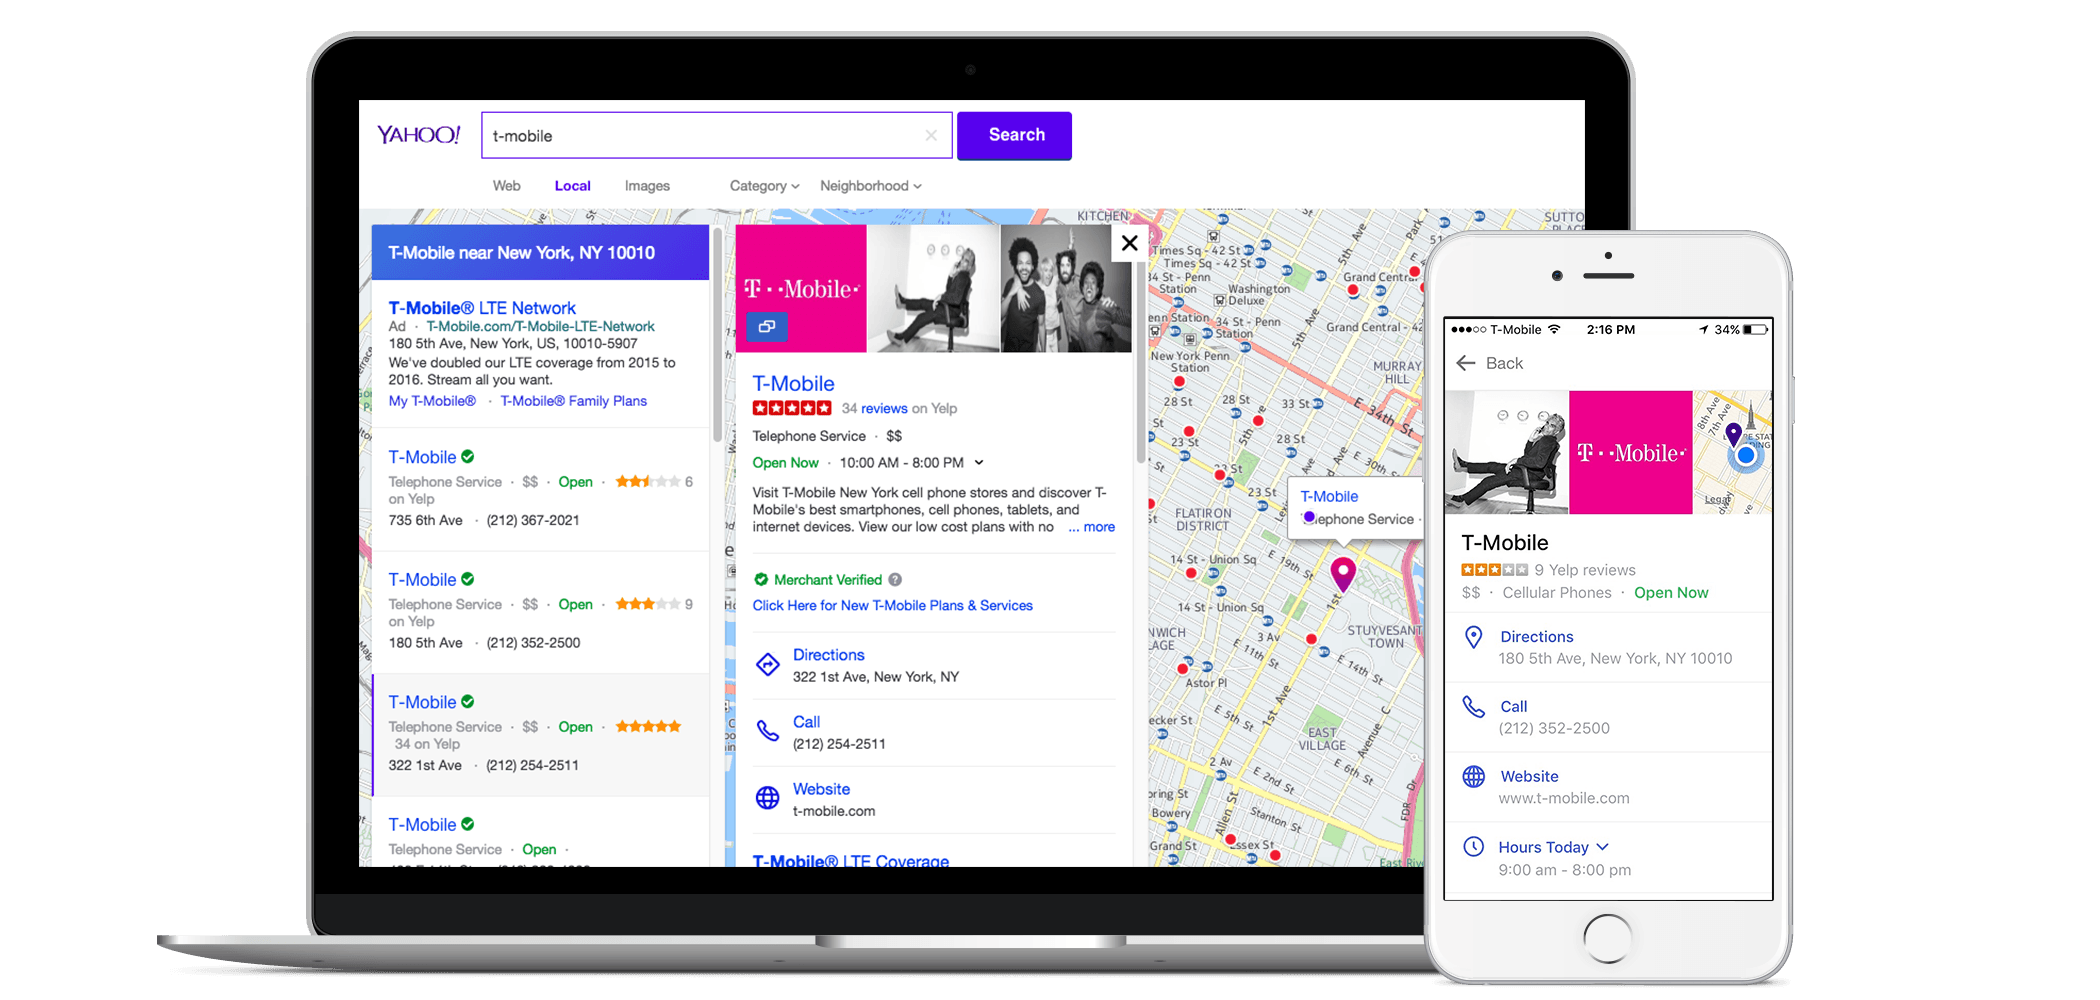 Yahoo! | Update Your Yahoo! Business Listings - Yext